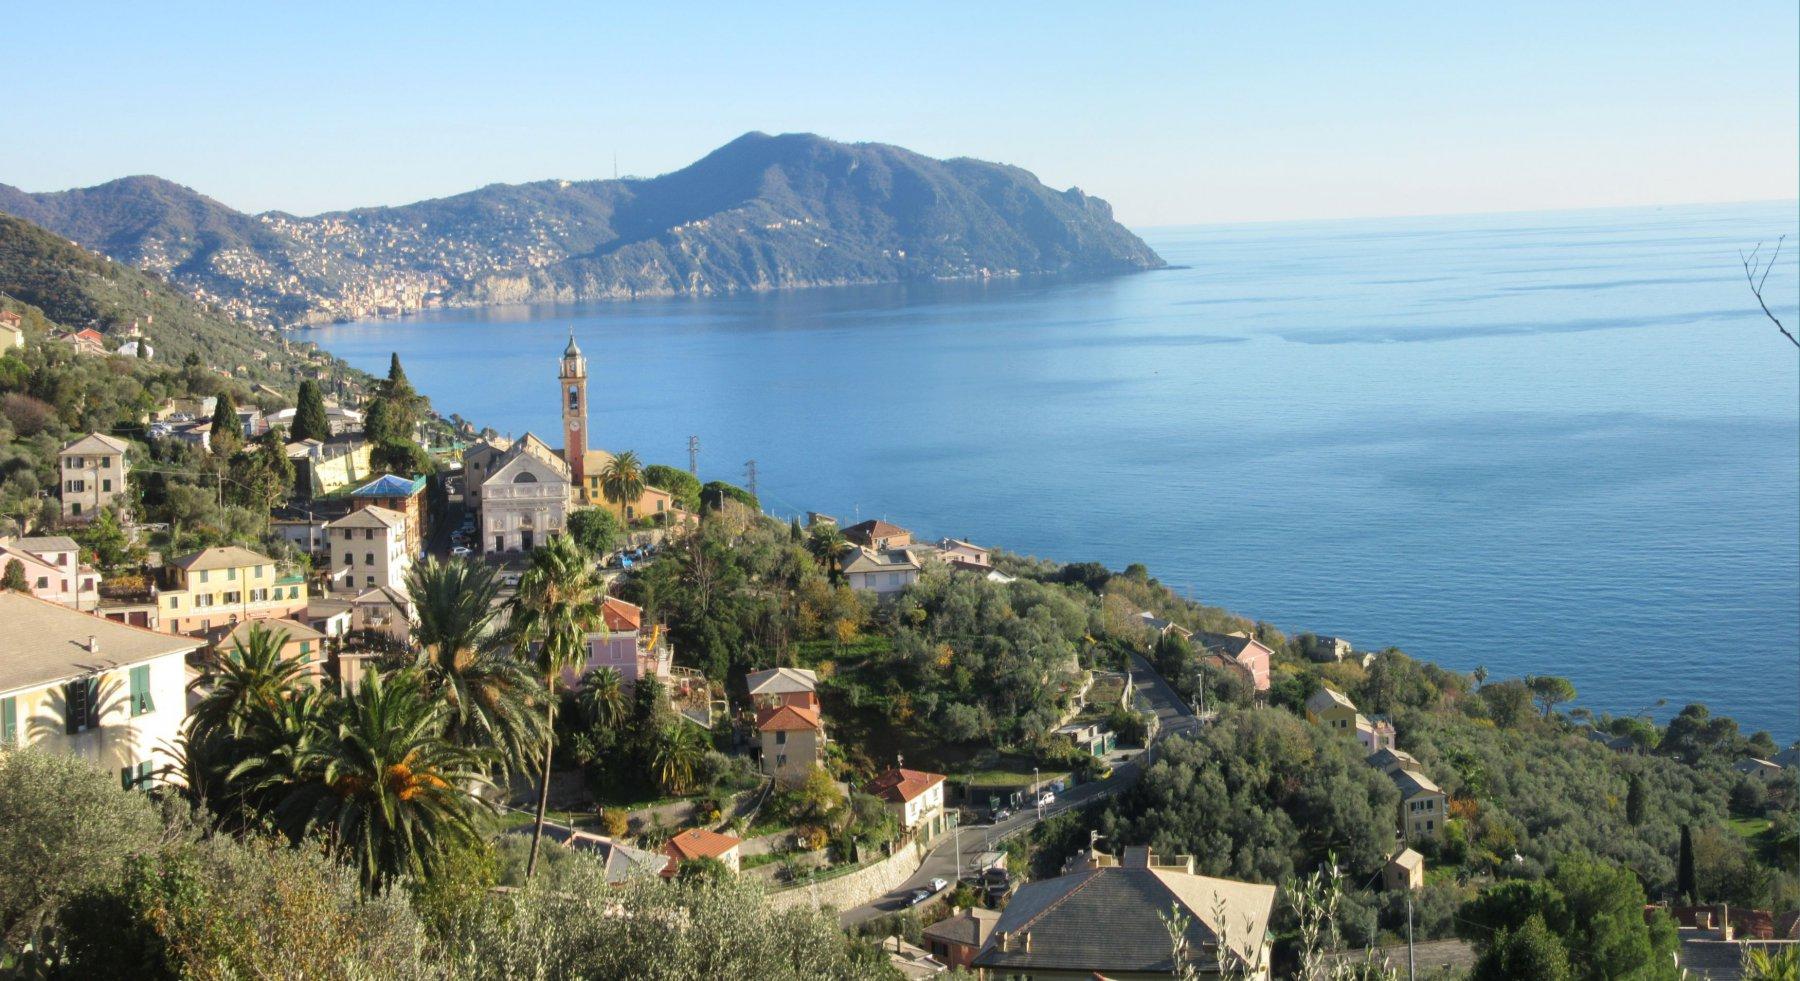 Cordona (Monte) da Nervi a Pieve Ligure 2016-11-30